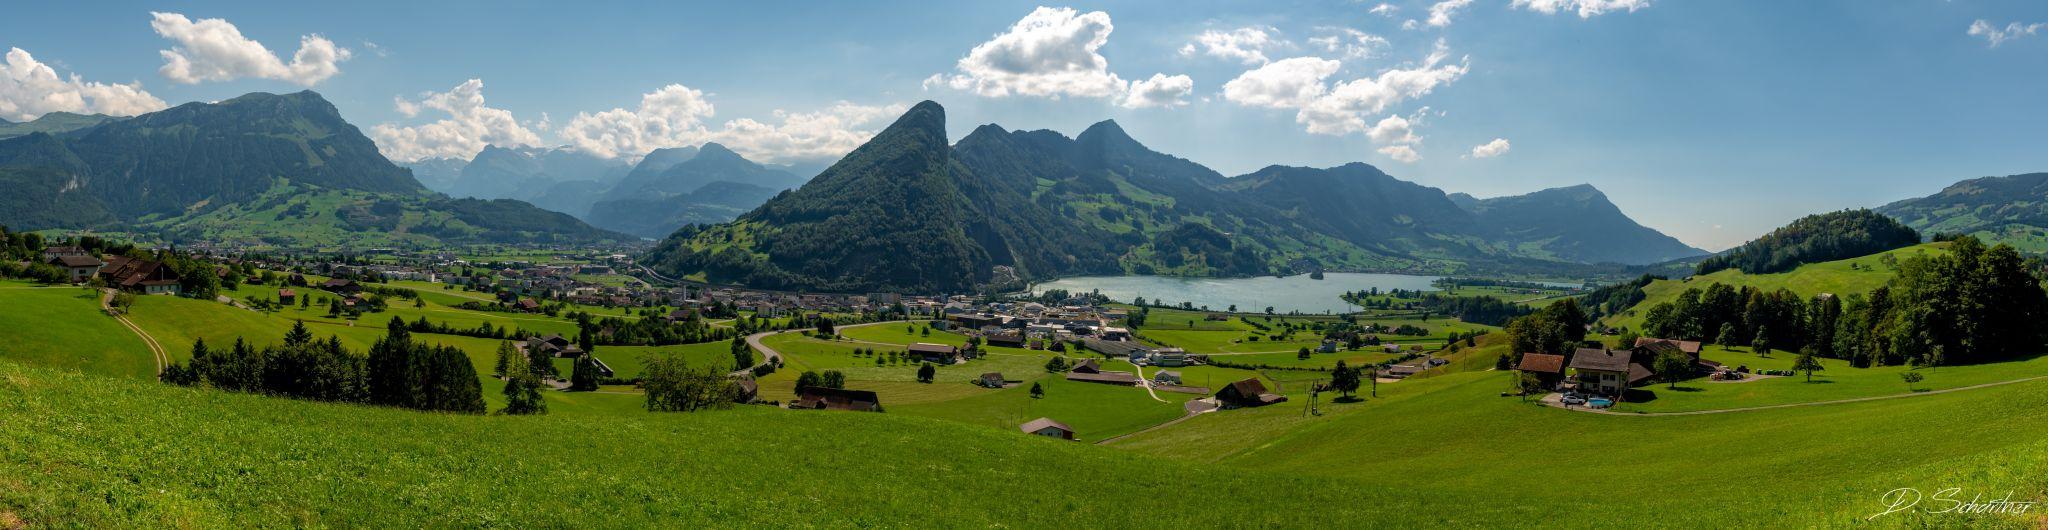 Bohl viewpoint, Switzerland